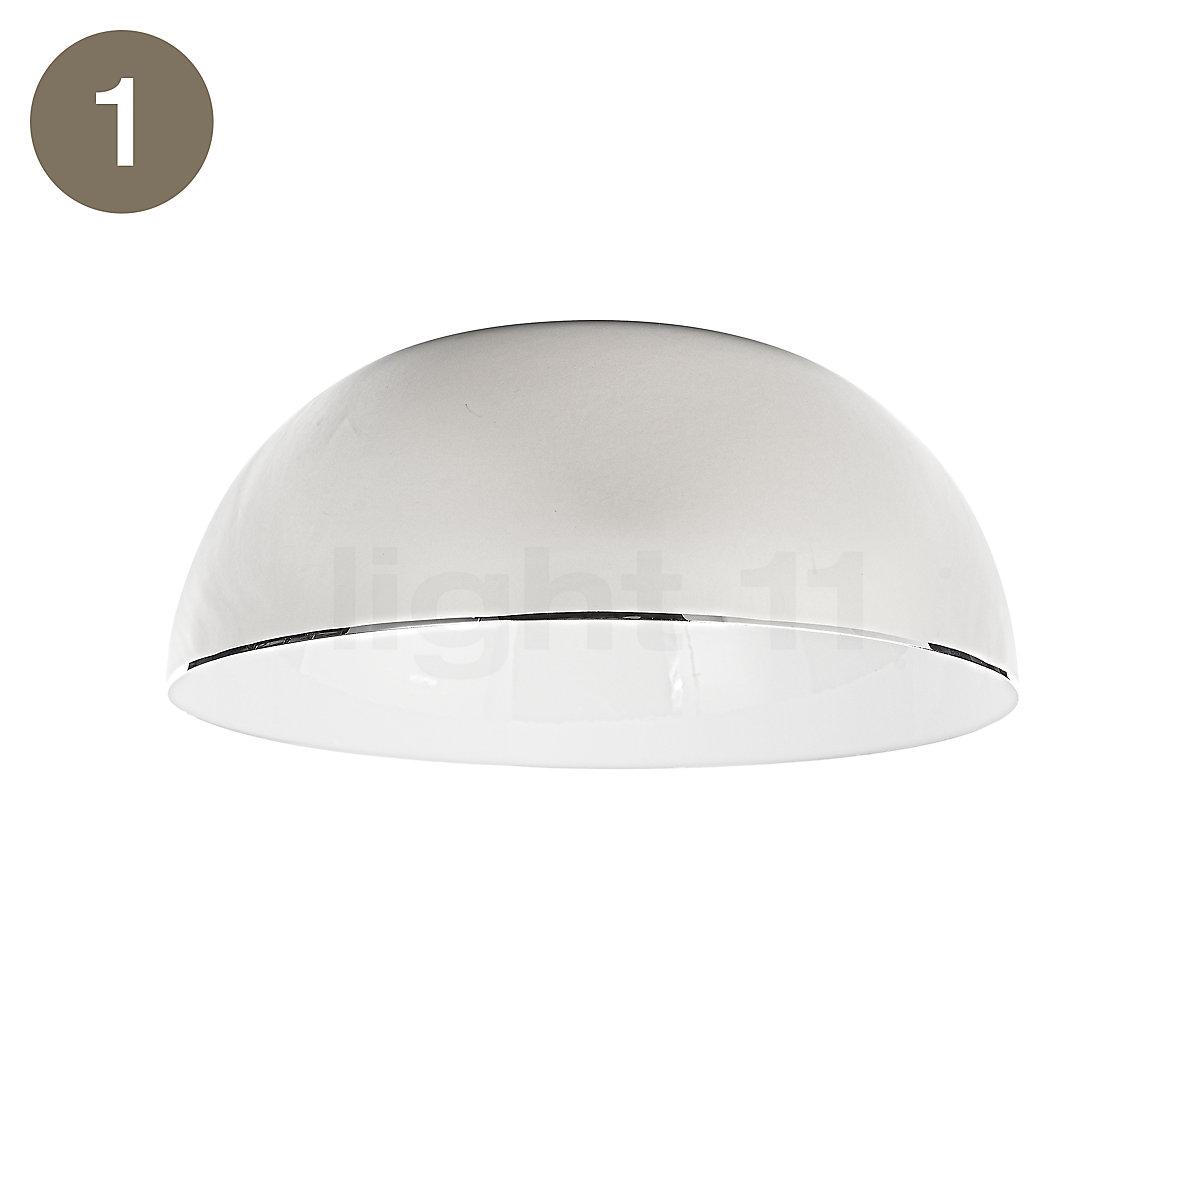 Flos Pezzi Di Ricambio Per Frisbi Light11 It